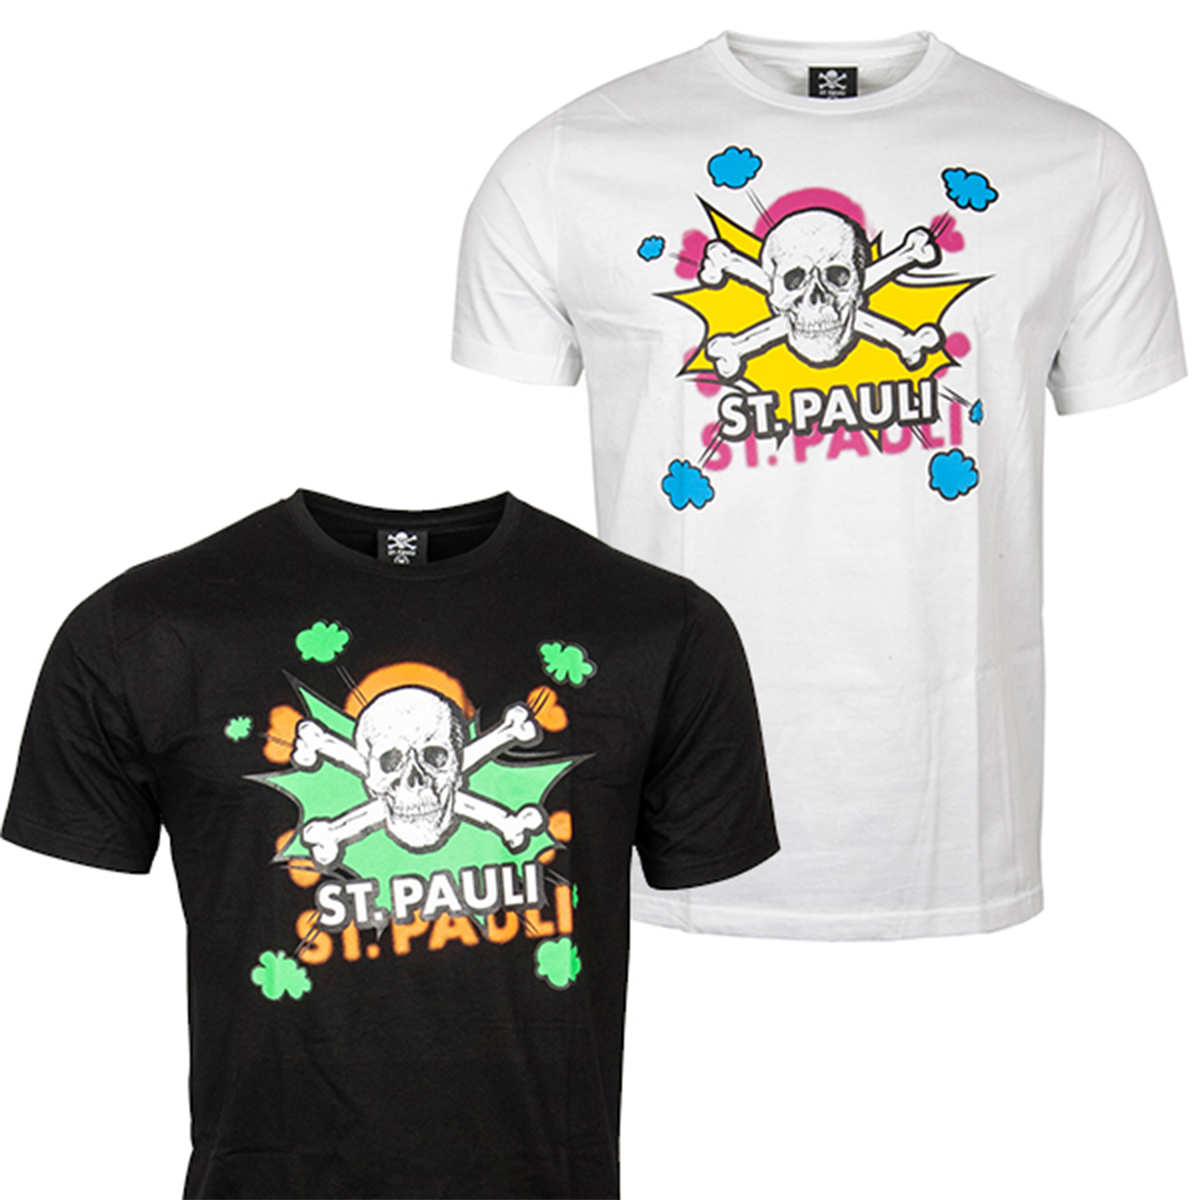 FC St. Pauli - T-Shirt Set Totenkopf Pow - Weiß/Schwarz